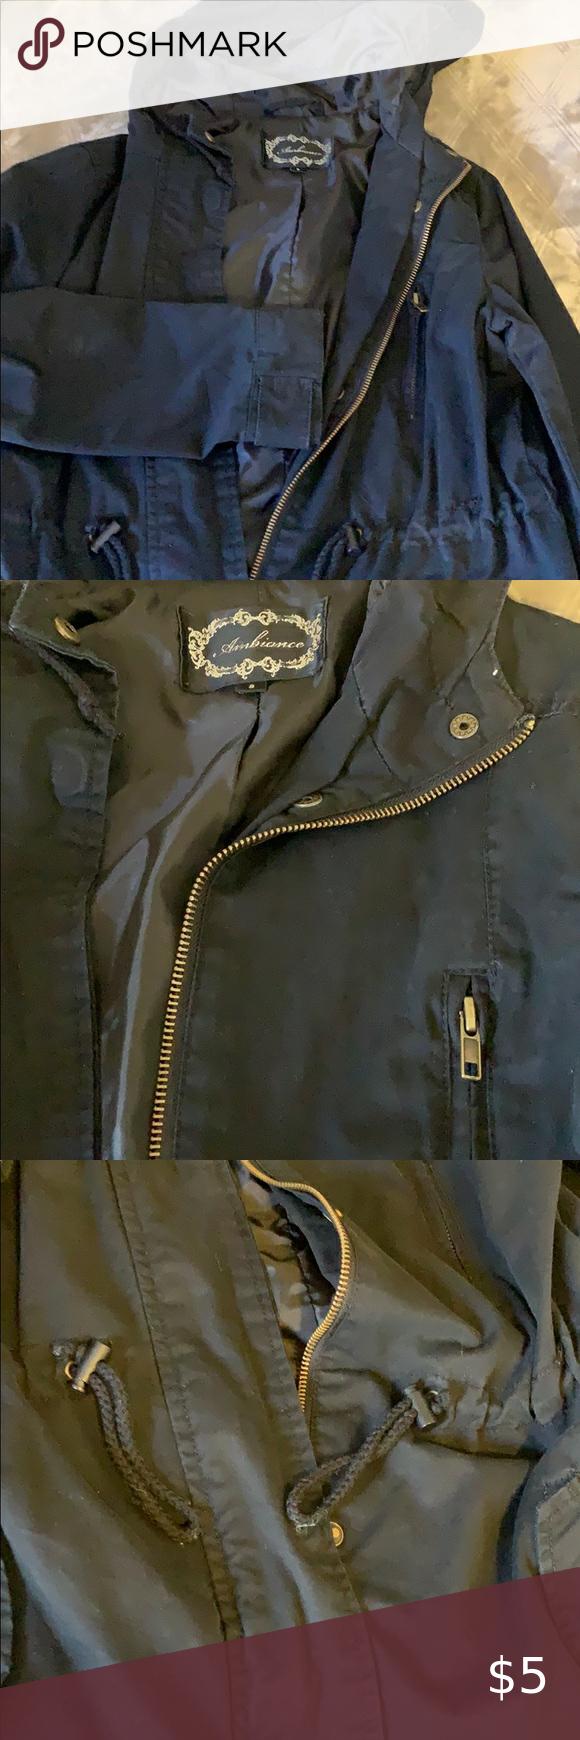 Ambiance Jacket Used Ambiance Jackets Coats Jackets Women Shopping Jackets For Women [ 1740 x 580 Pixel ]